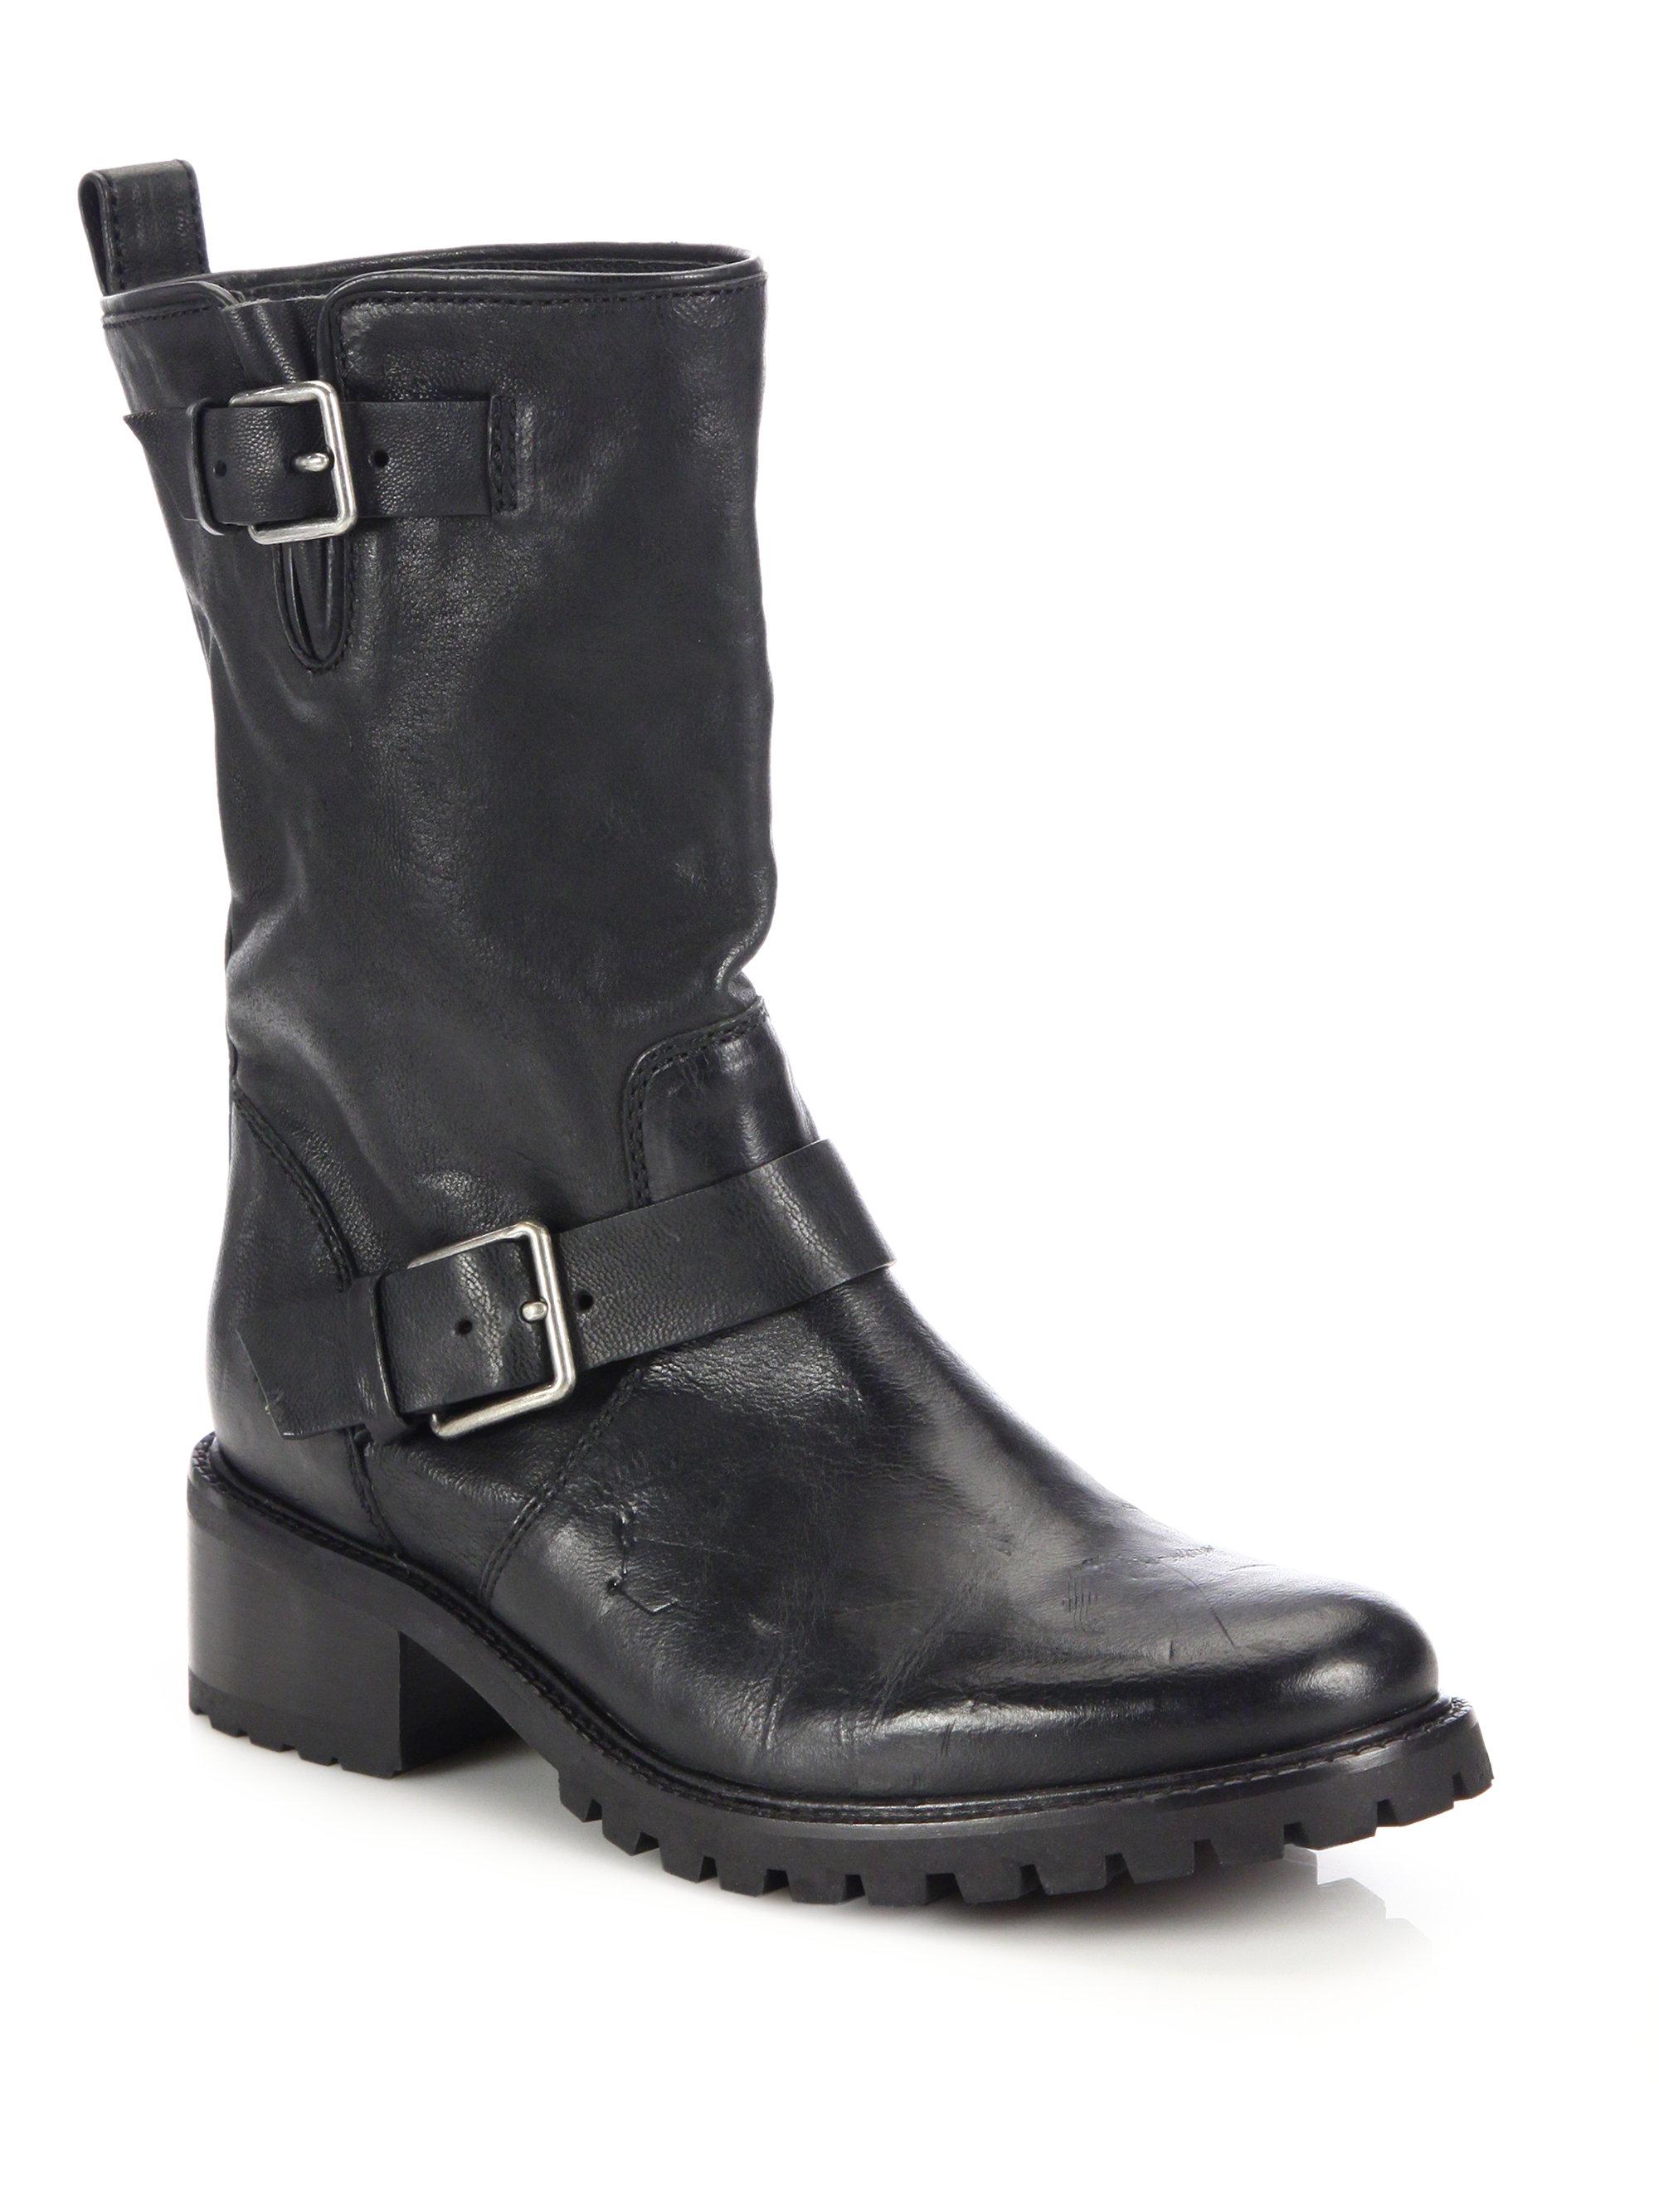 Lyst Cole Haan Hemlock Leather Motorcycle Boots In Black